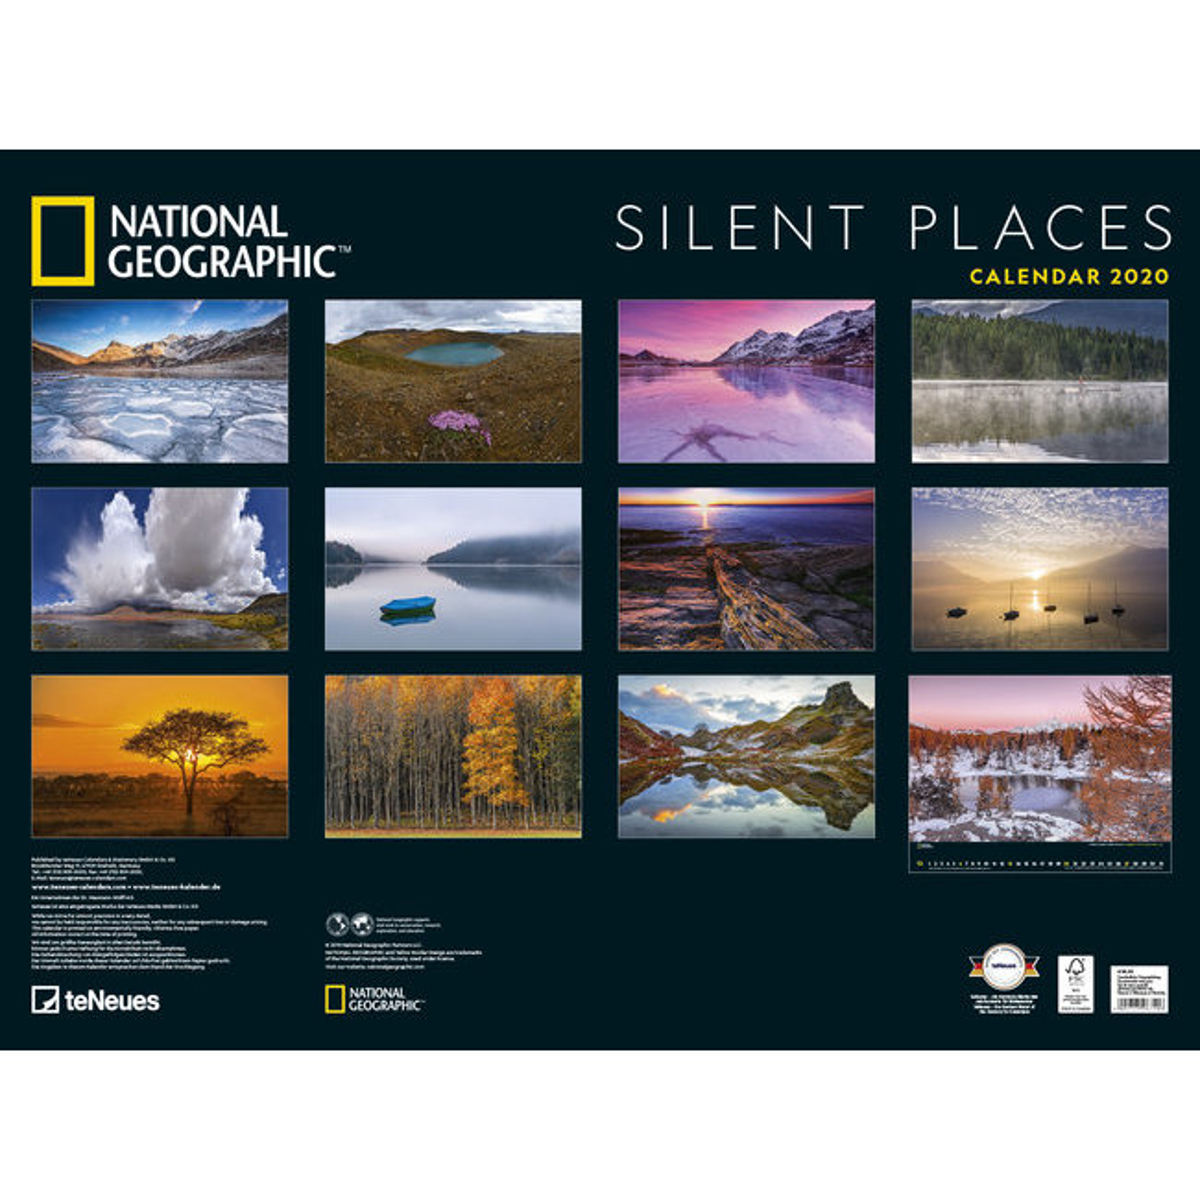 Calendrier National 2020.Maxi Calendrier Poster 2020 Paysage Silencieux Par National Geograhic